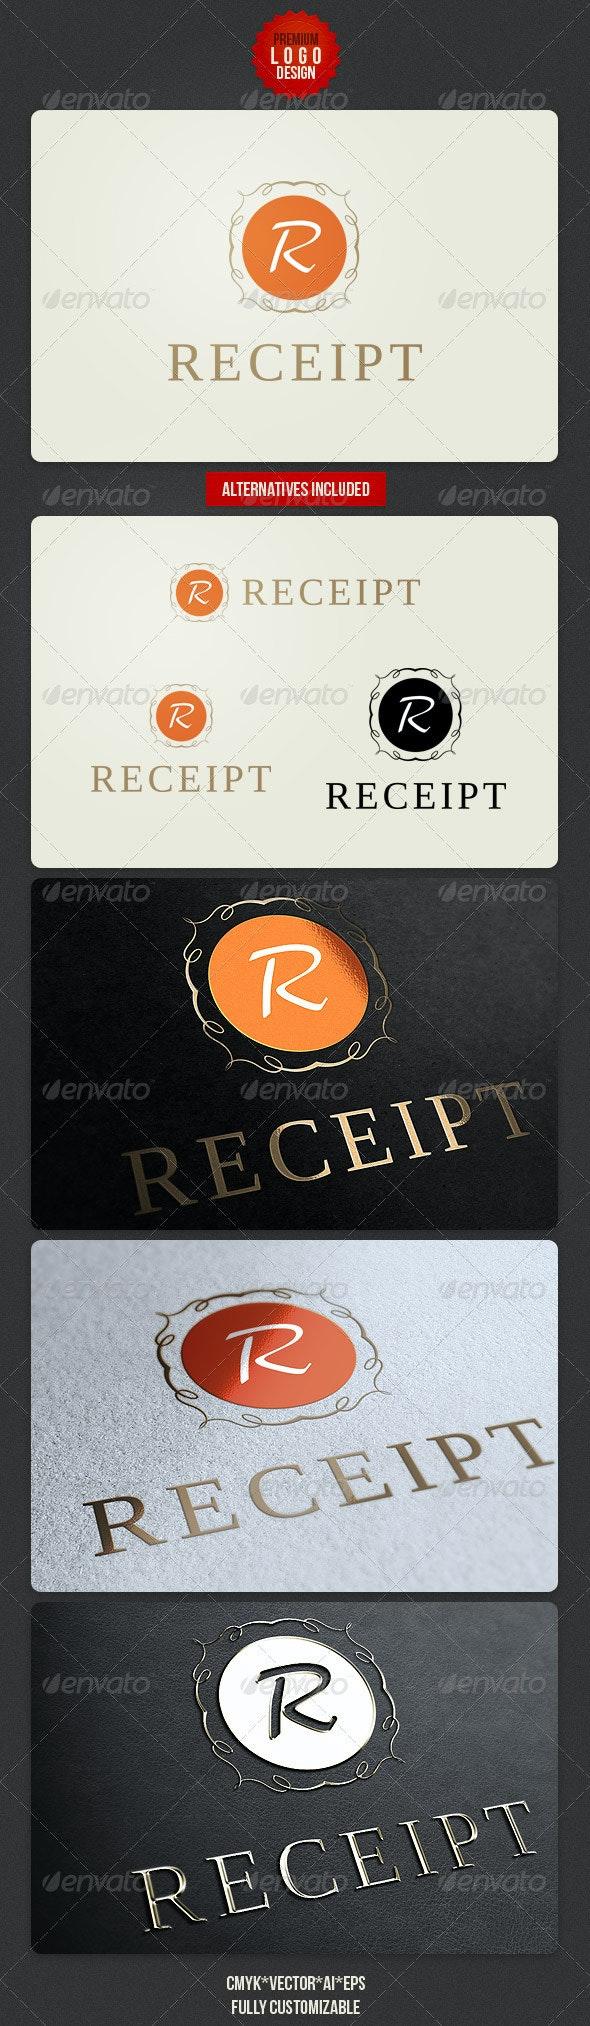 Receipt Retro Logo Design - Letters Logo Templates